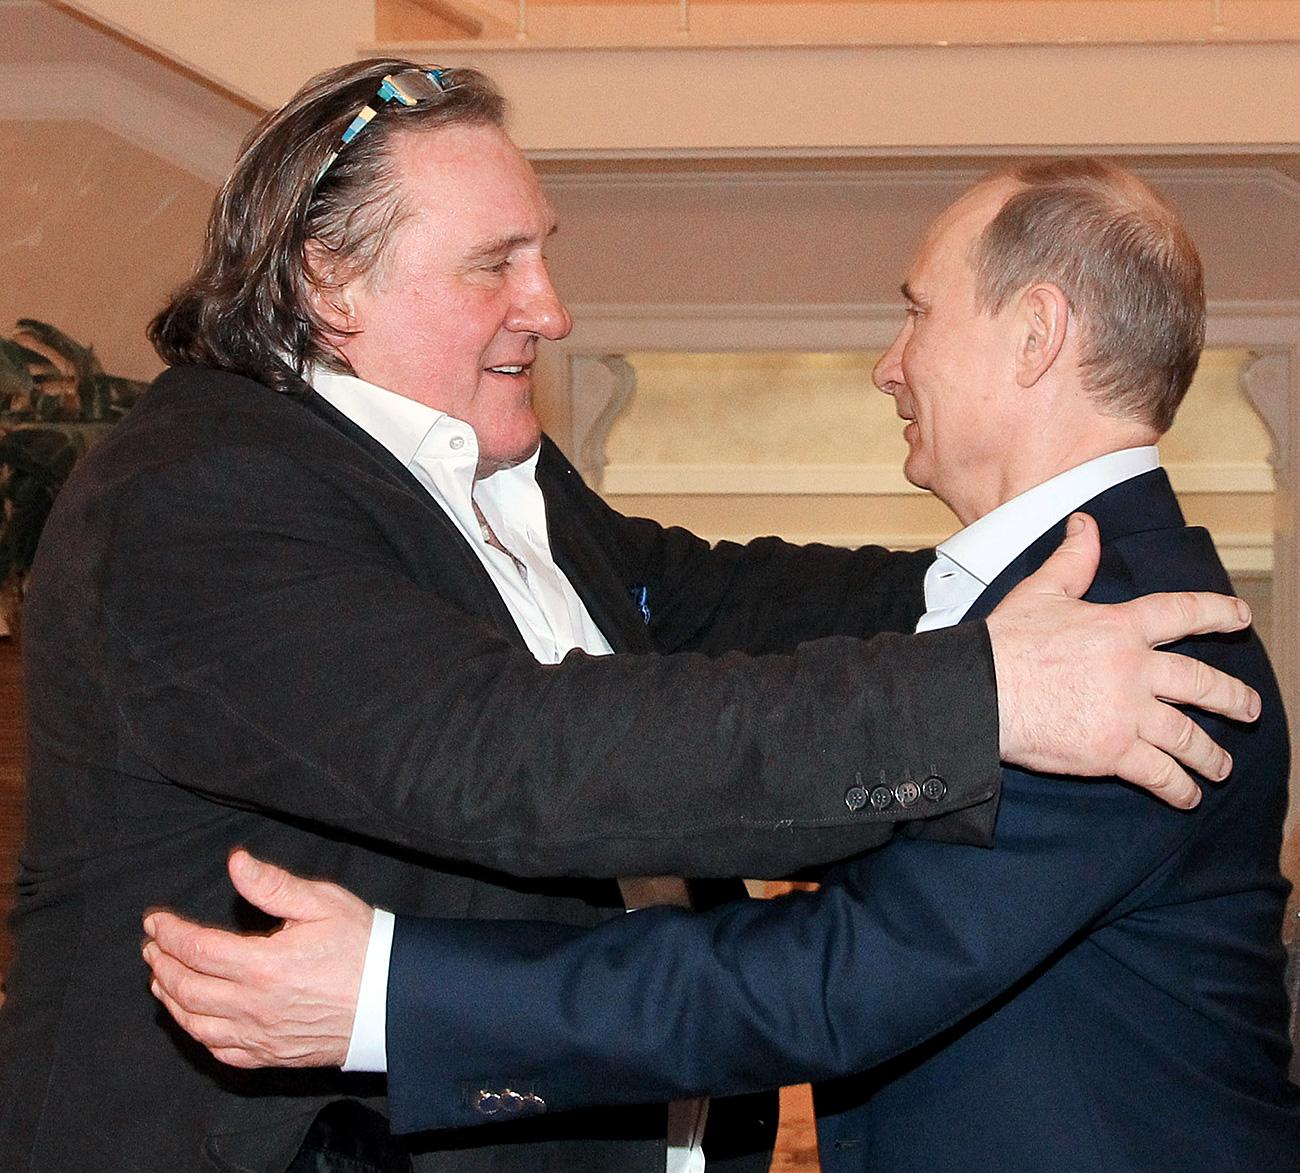 President Vladimir Putin, right, and French actor Gerard Depardieu, who has been handed his new Russian passport, meet in Sochi. Source: Michael Klimentyev/RIA Novosti